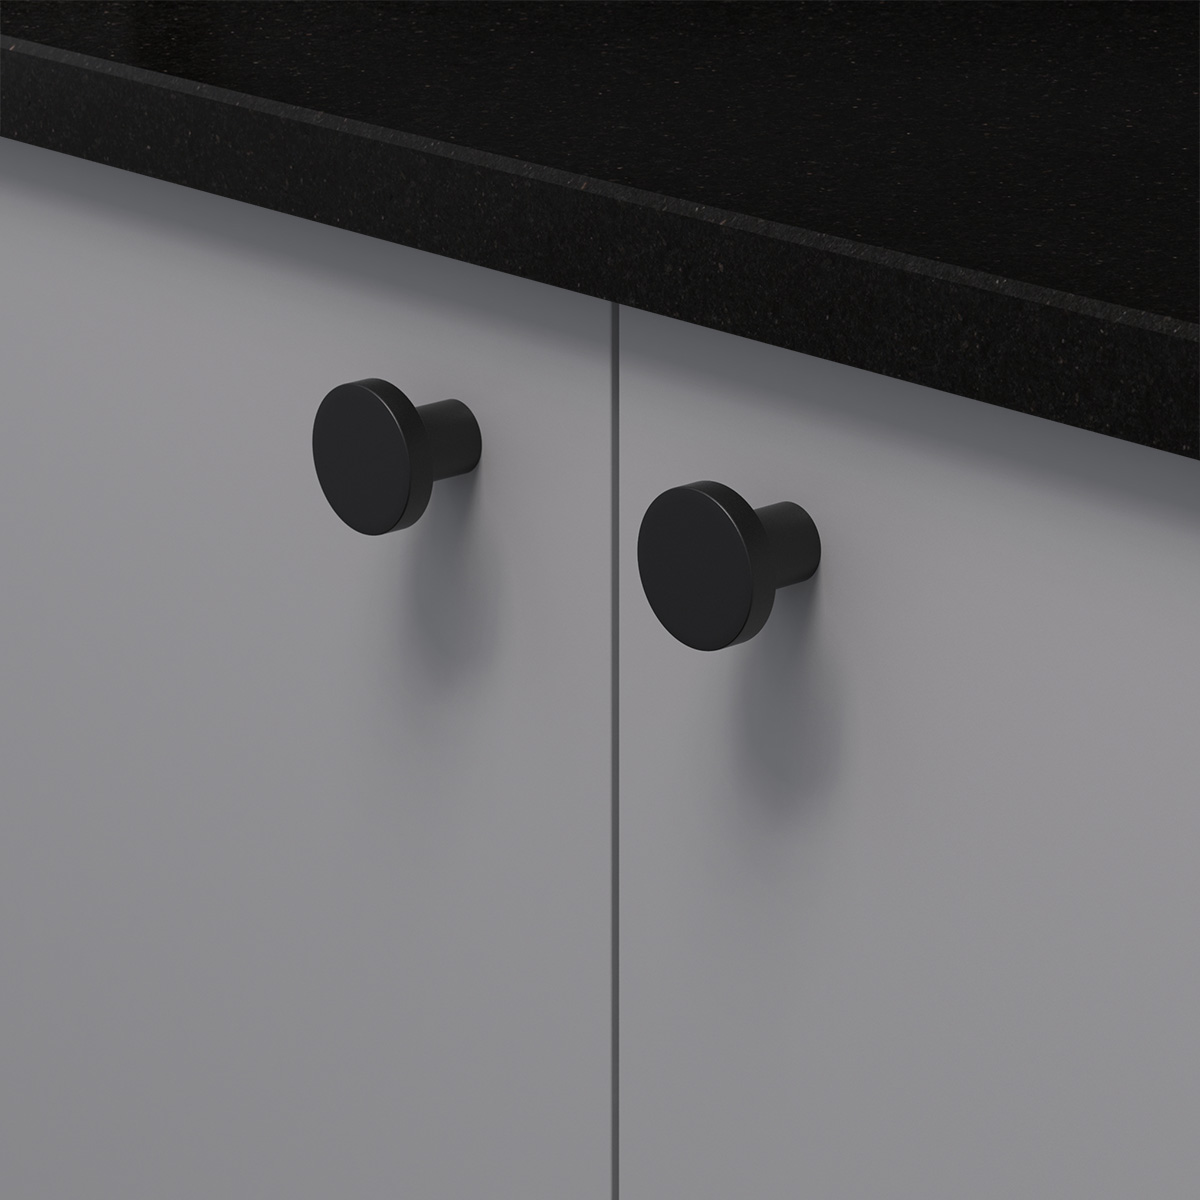 Knopp 2078 svart 368053 11 28 mm ncs s 4500 n granit svart